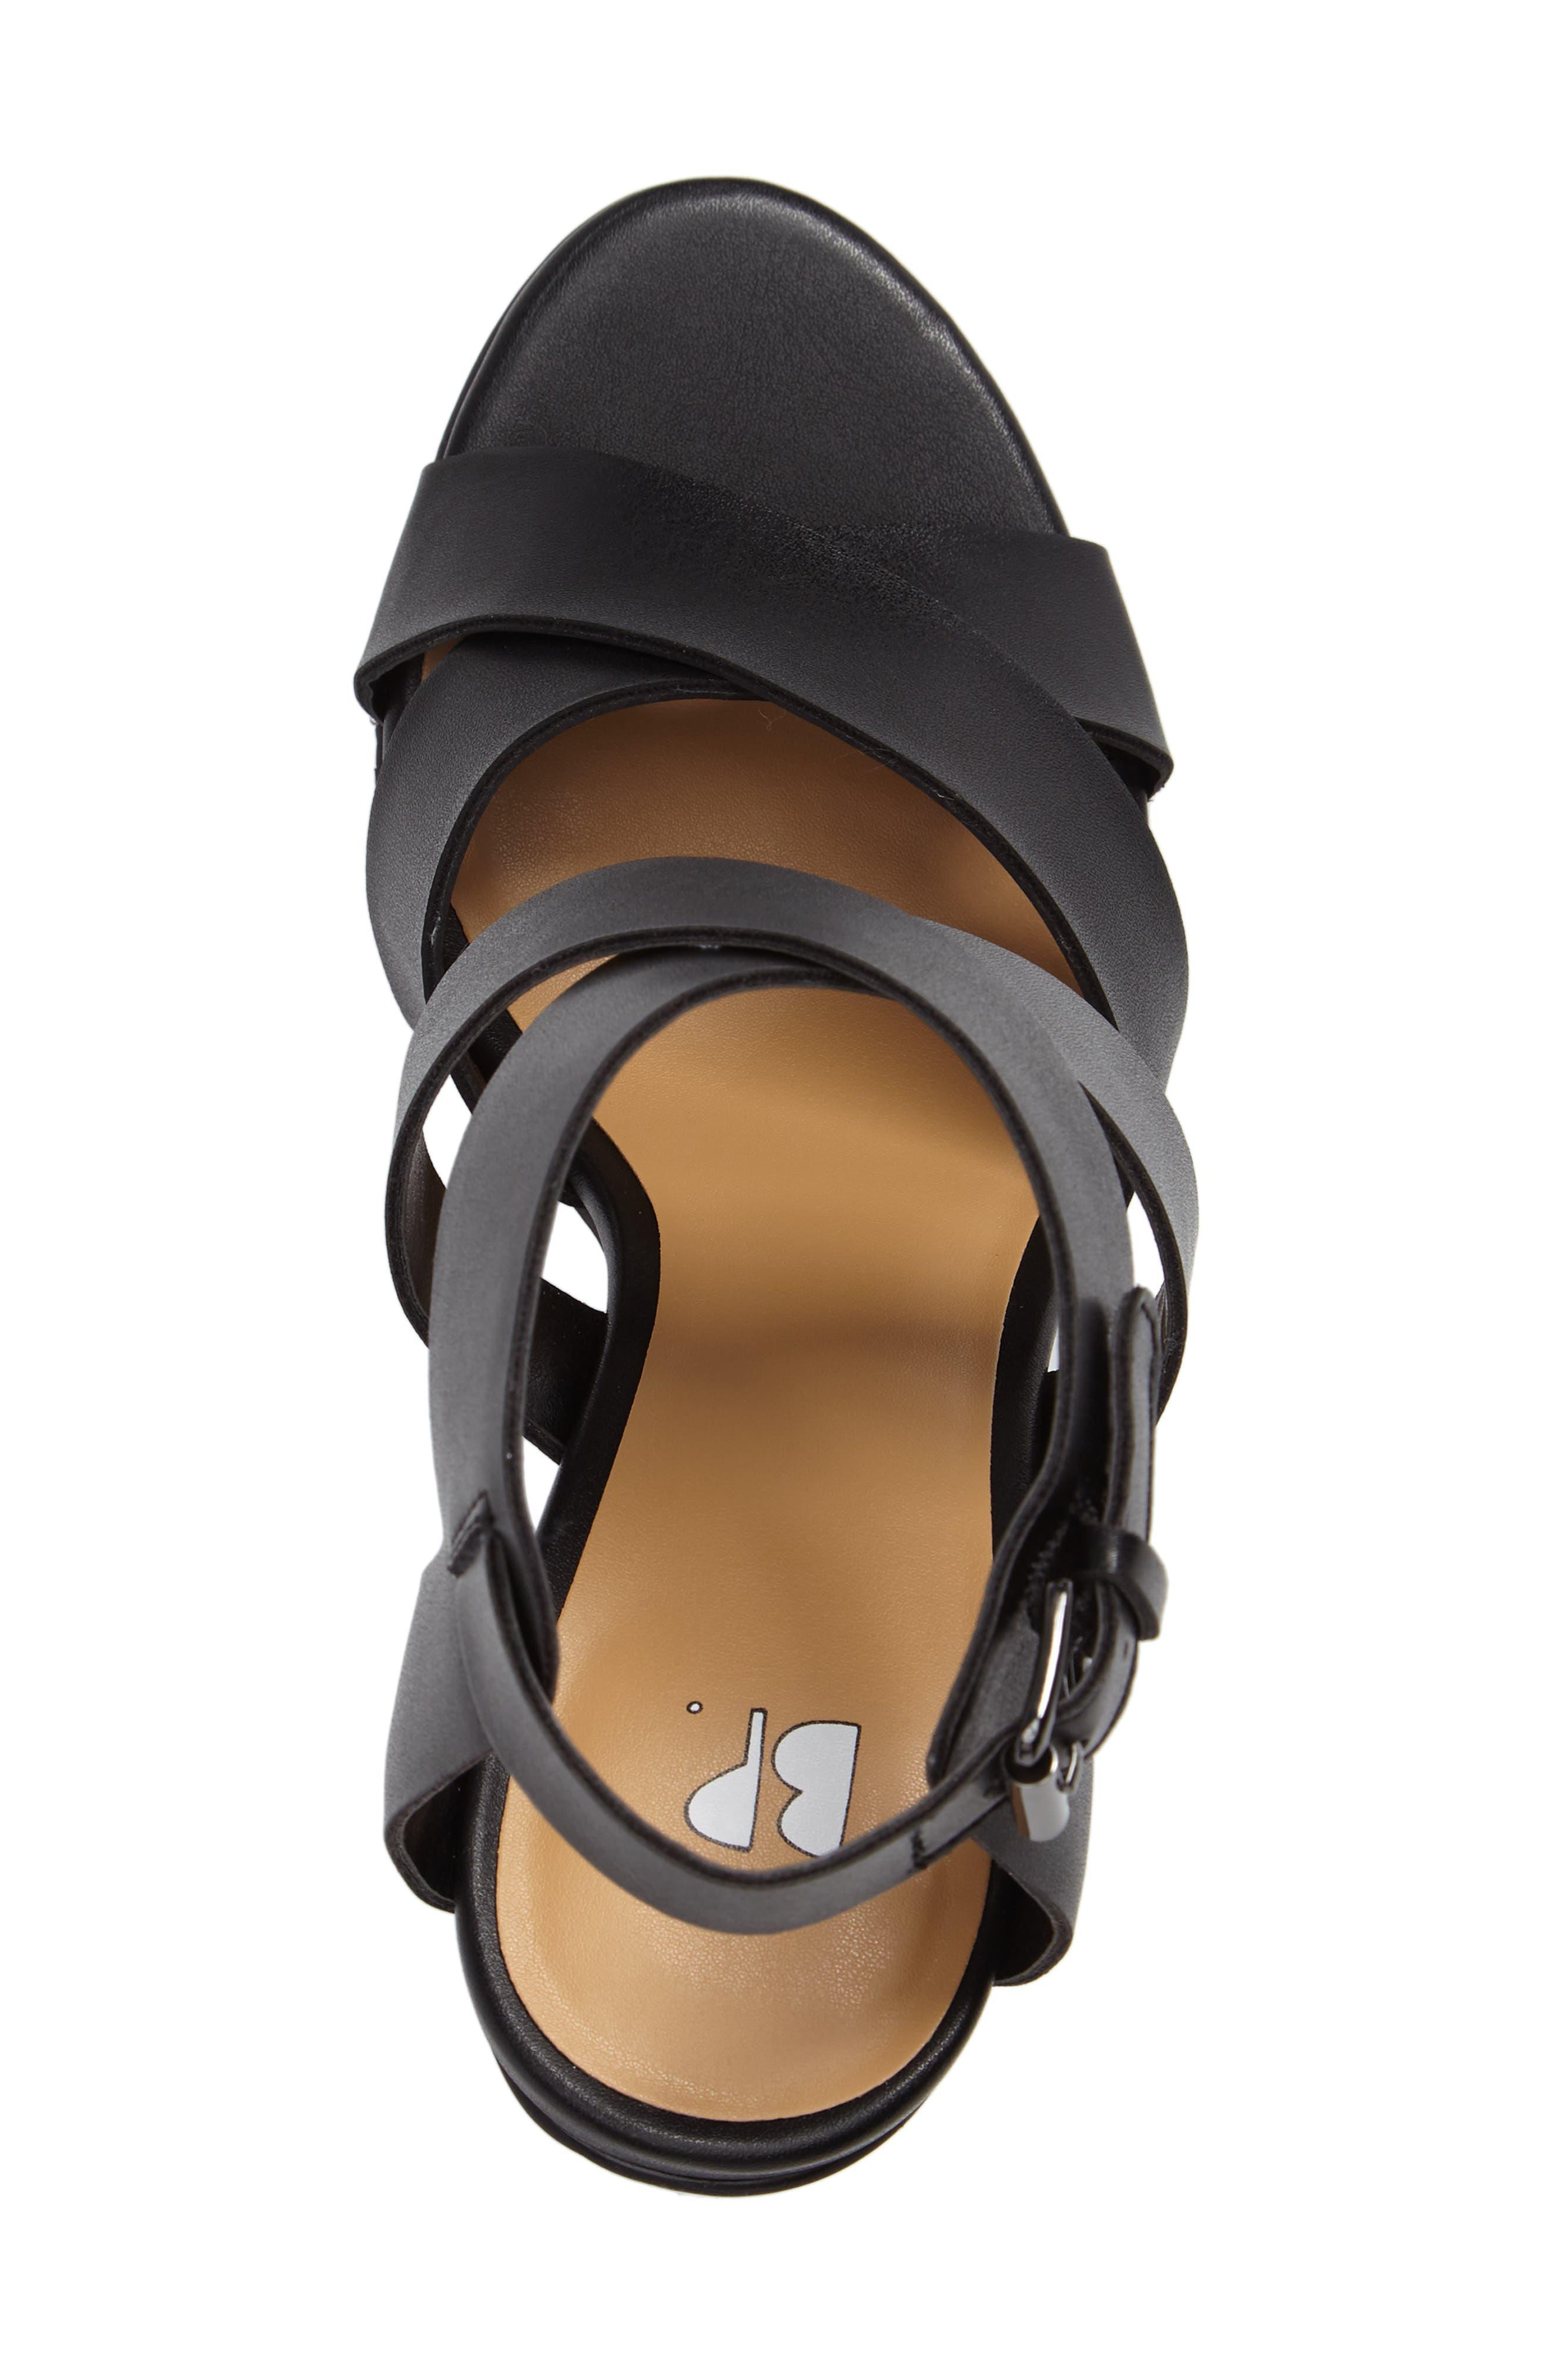 Terry Block Heel Sandal,                             Alternate thumbnail 3, color,                             Black Faux Leather